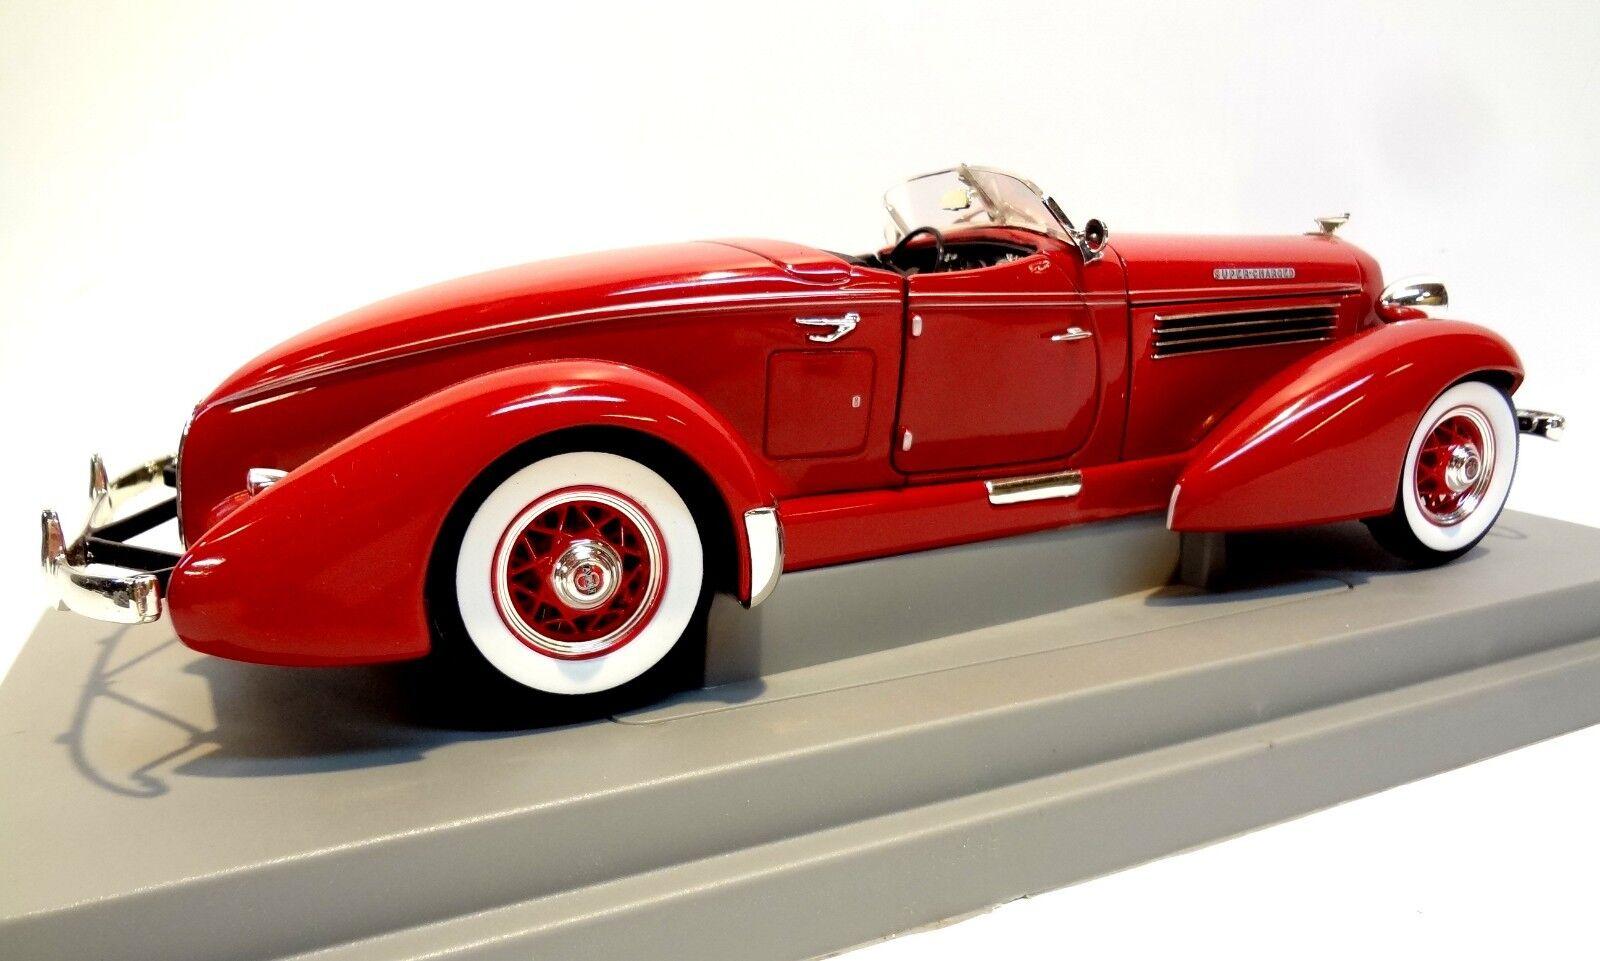 1935 auburn 851 speedster ertl 1 18th skala druckguss amerikanische power - sammlung